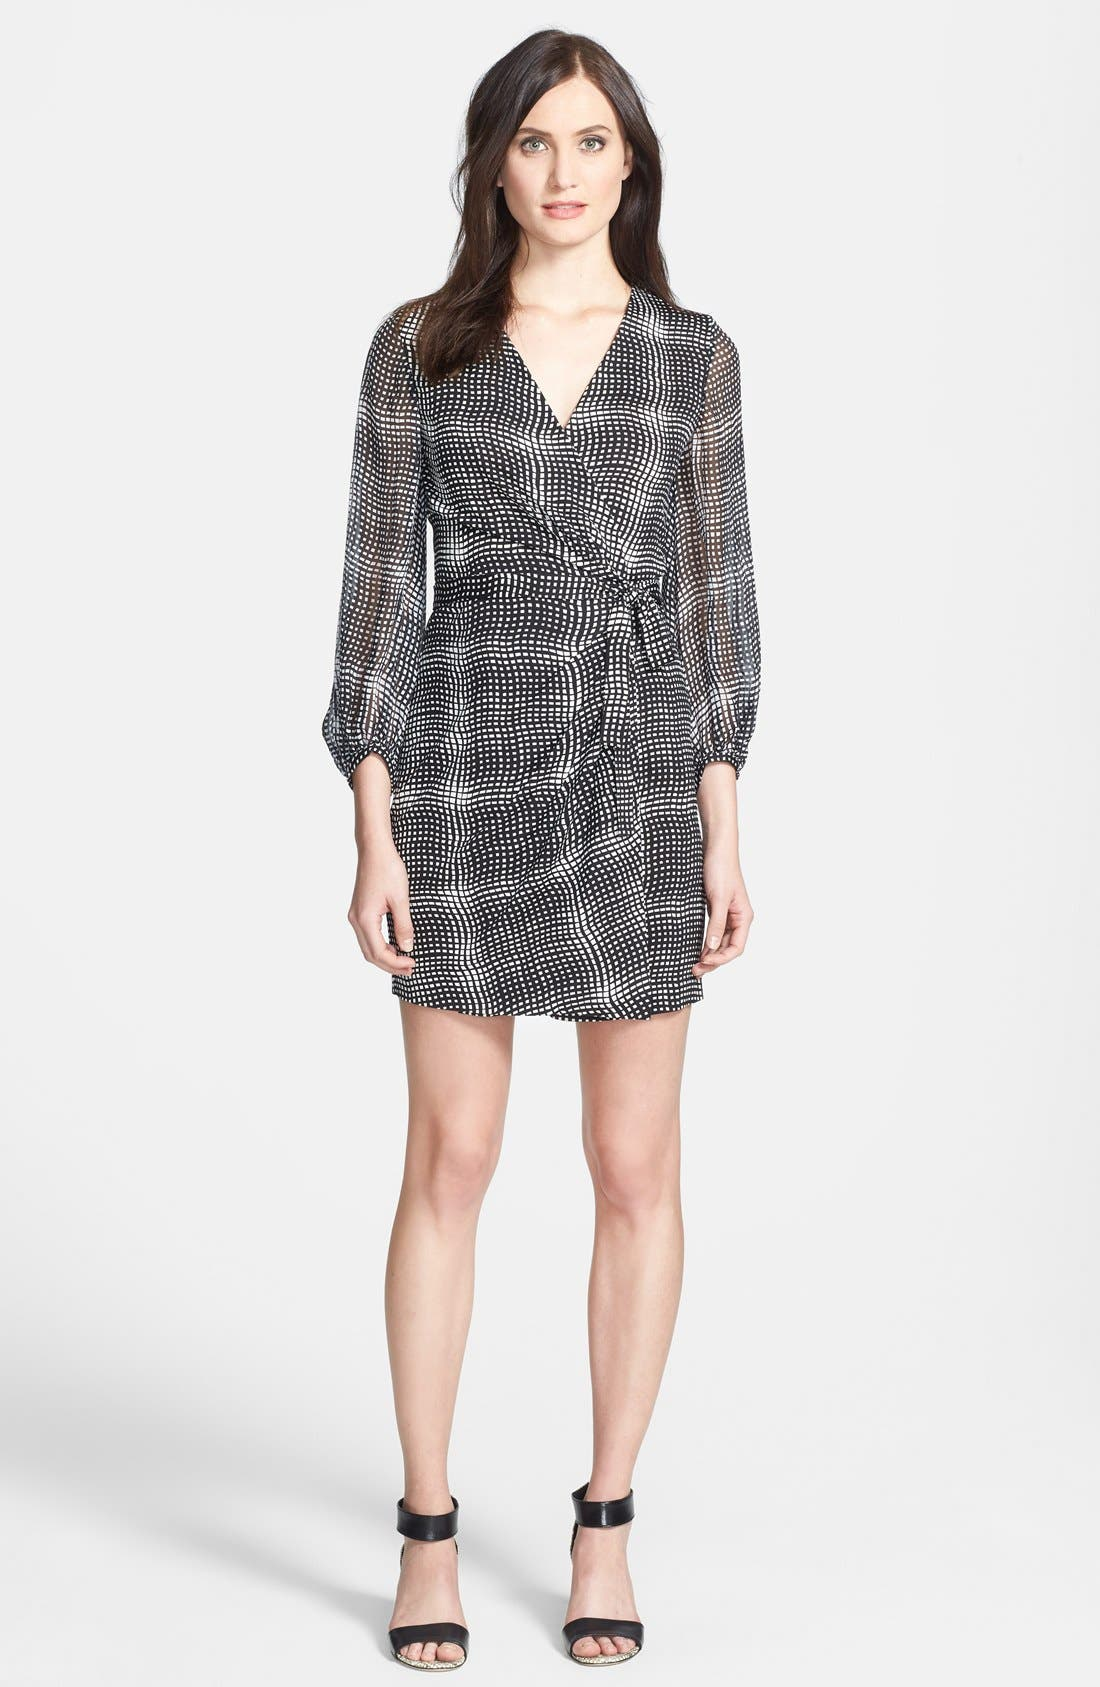 Alternate Image 1 Selected - Diane von Furstenberg 'Sigourney' Print Silk Wrap Dress